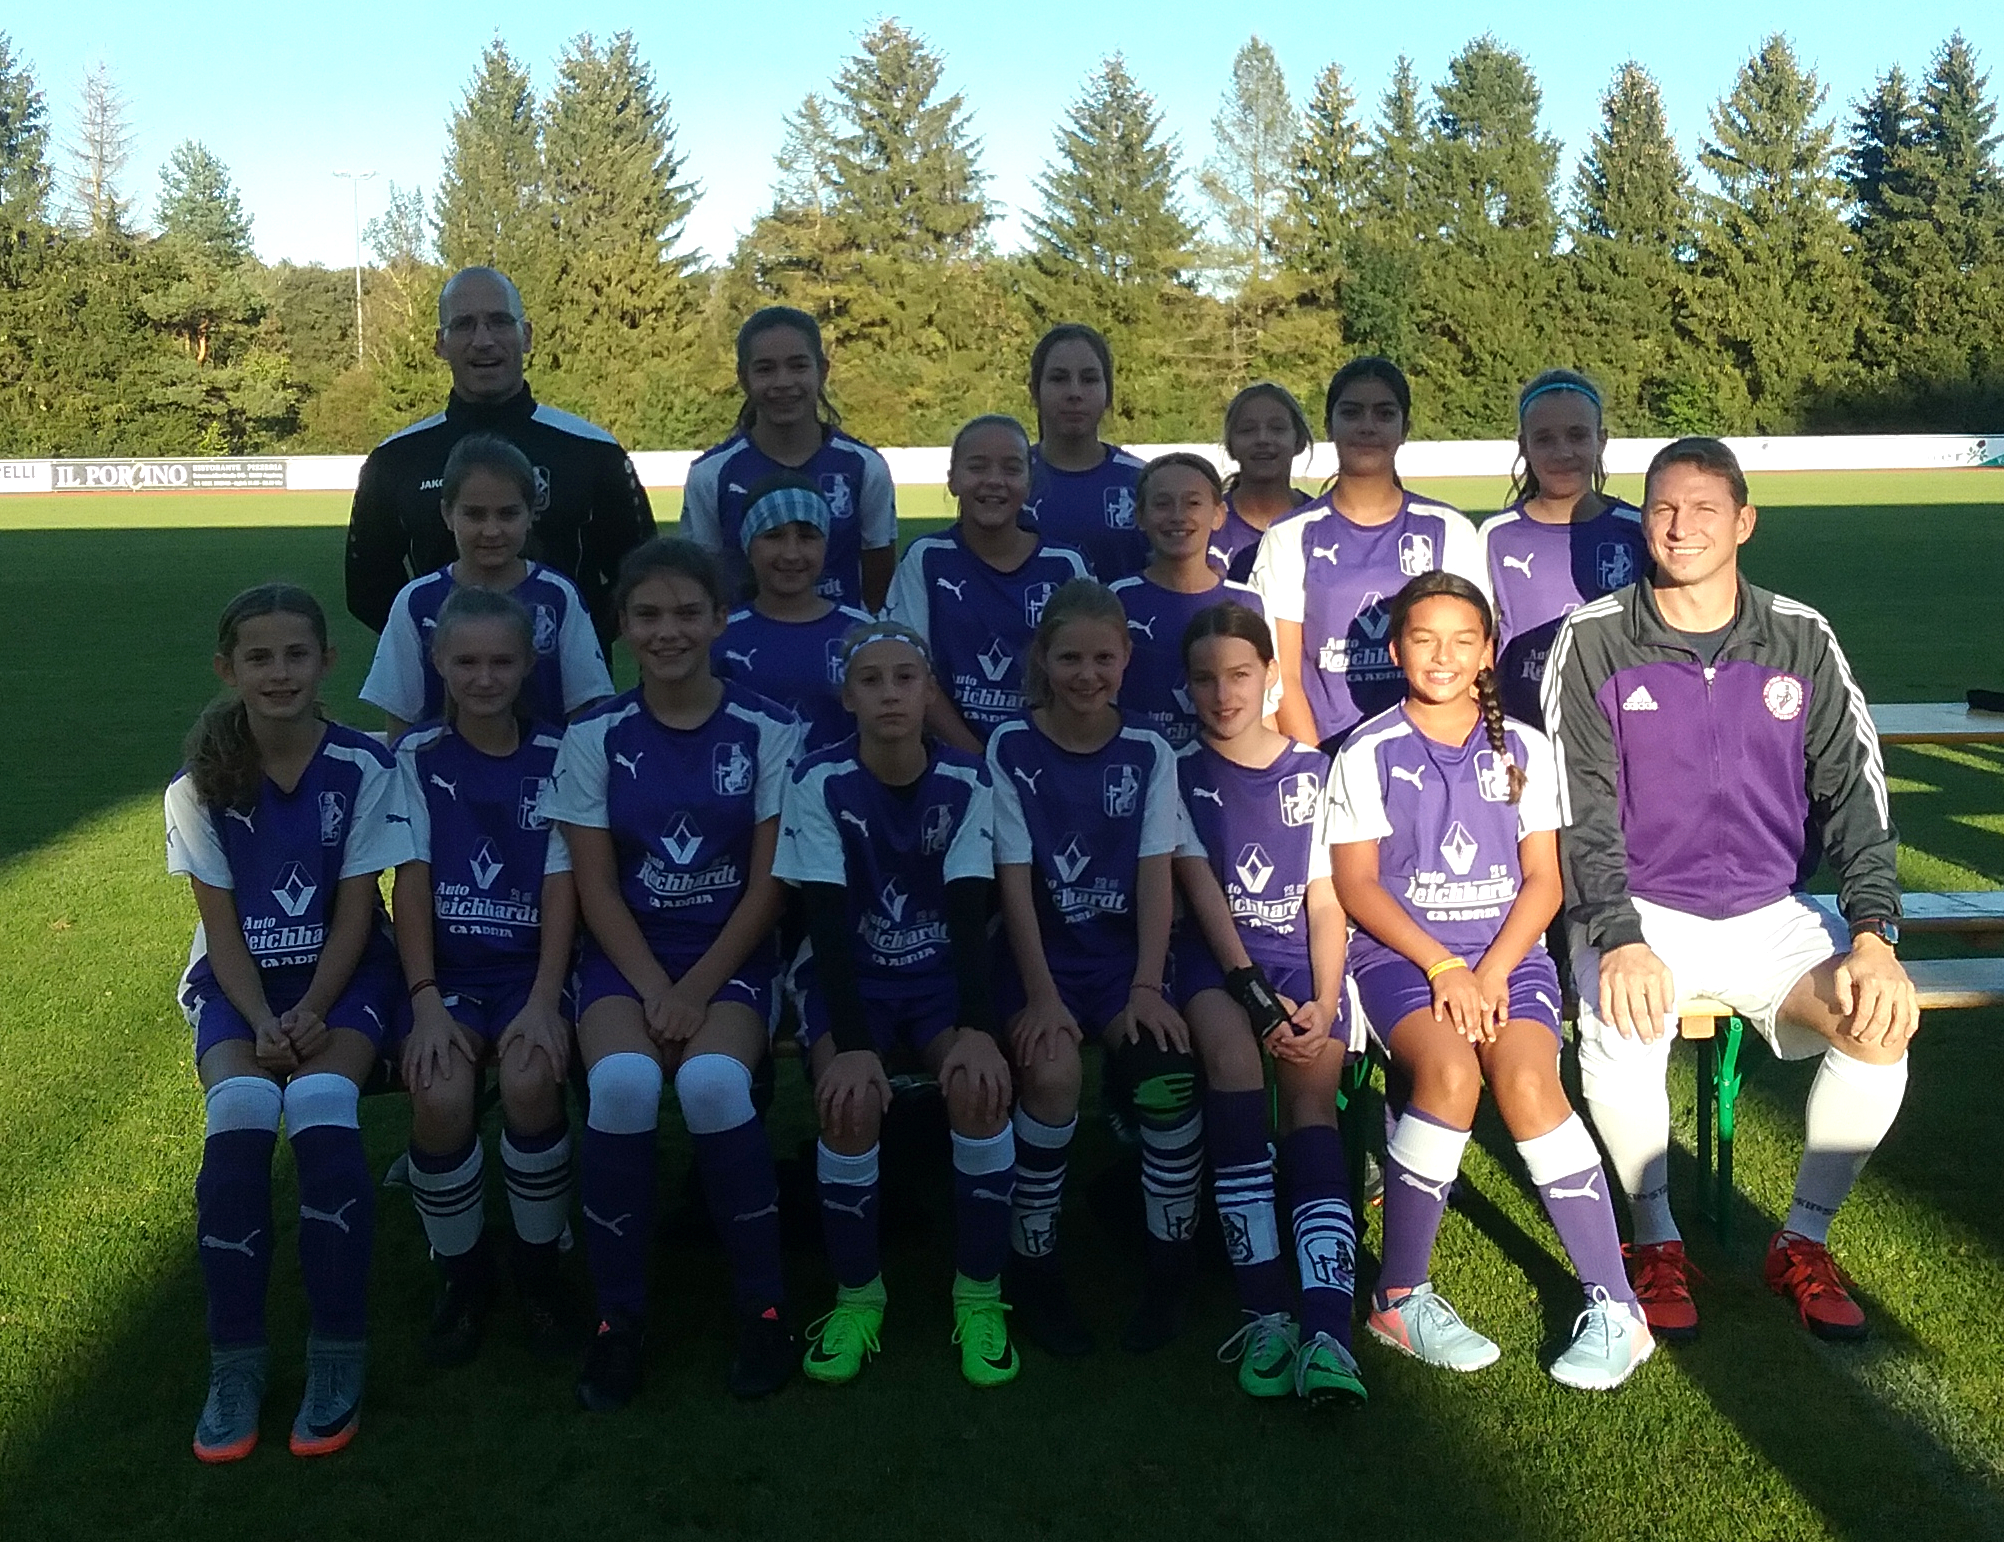 TSV Schwaben U13 (D1) Juniorinnen - Saison 2018/2019